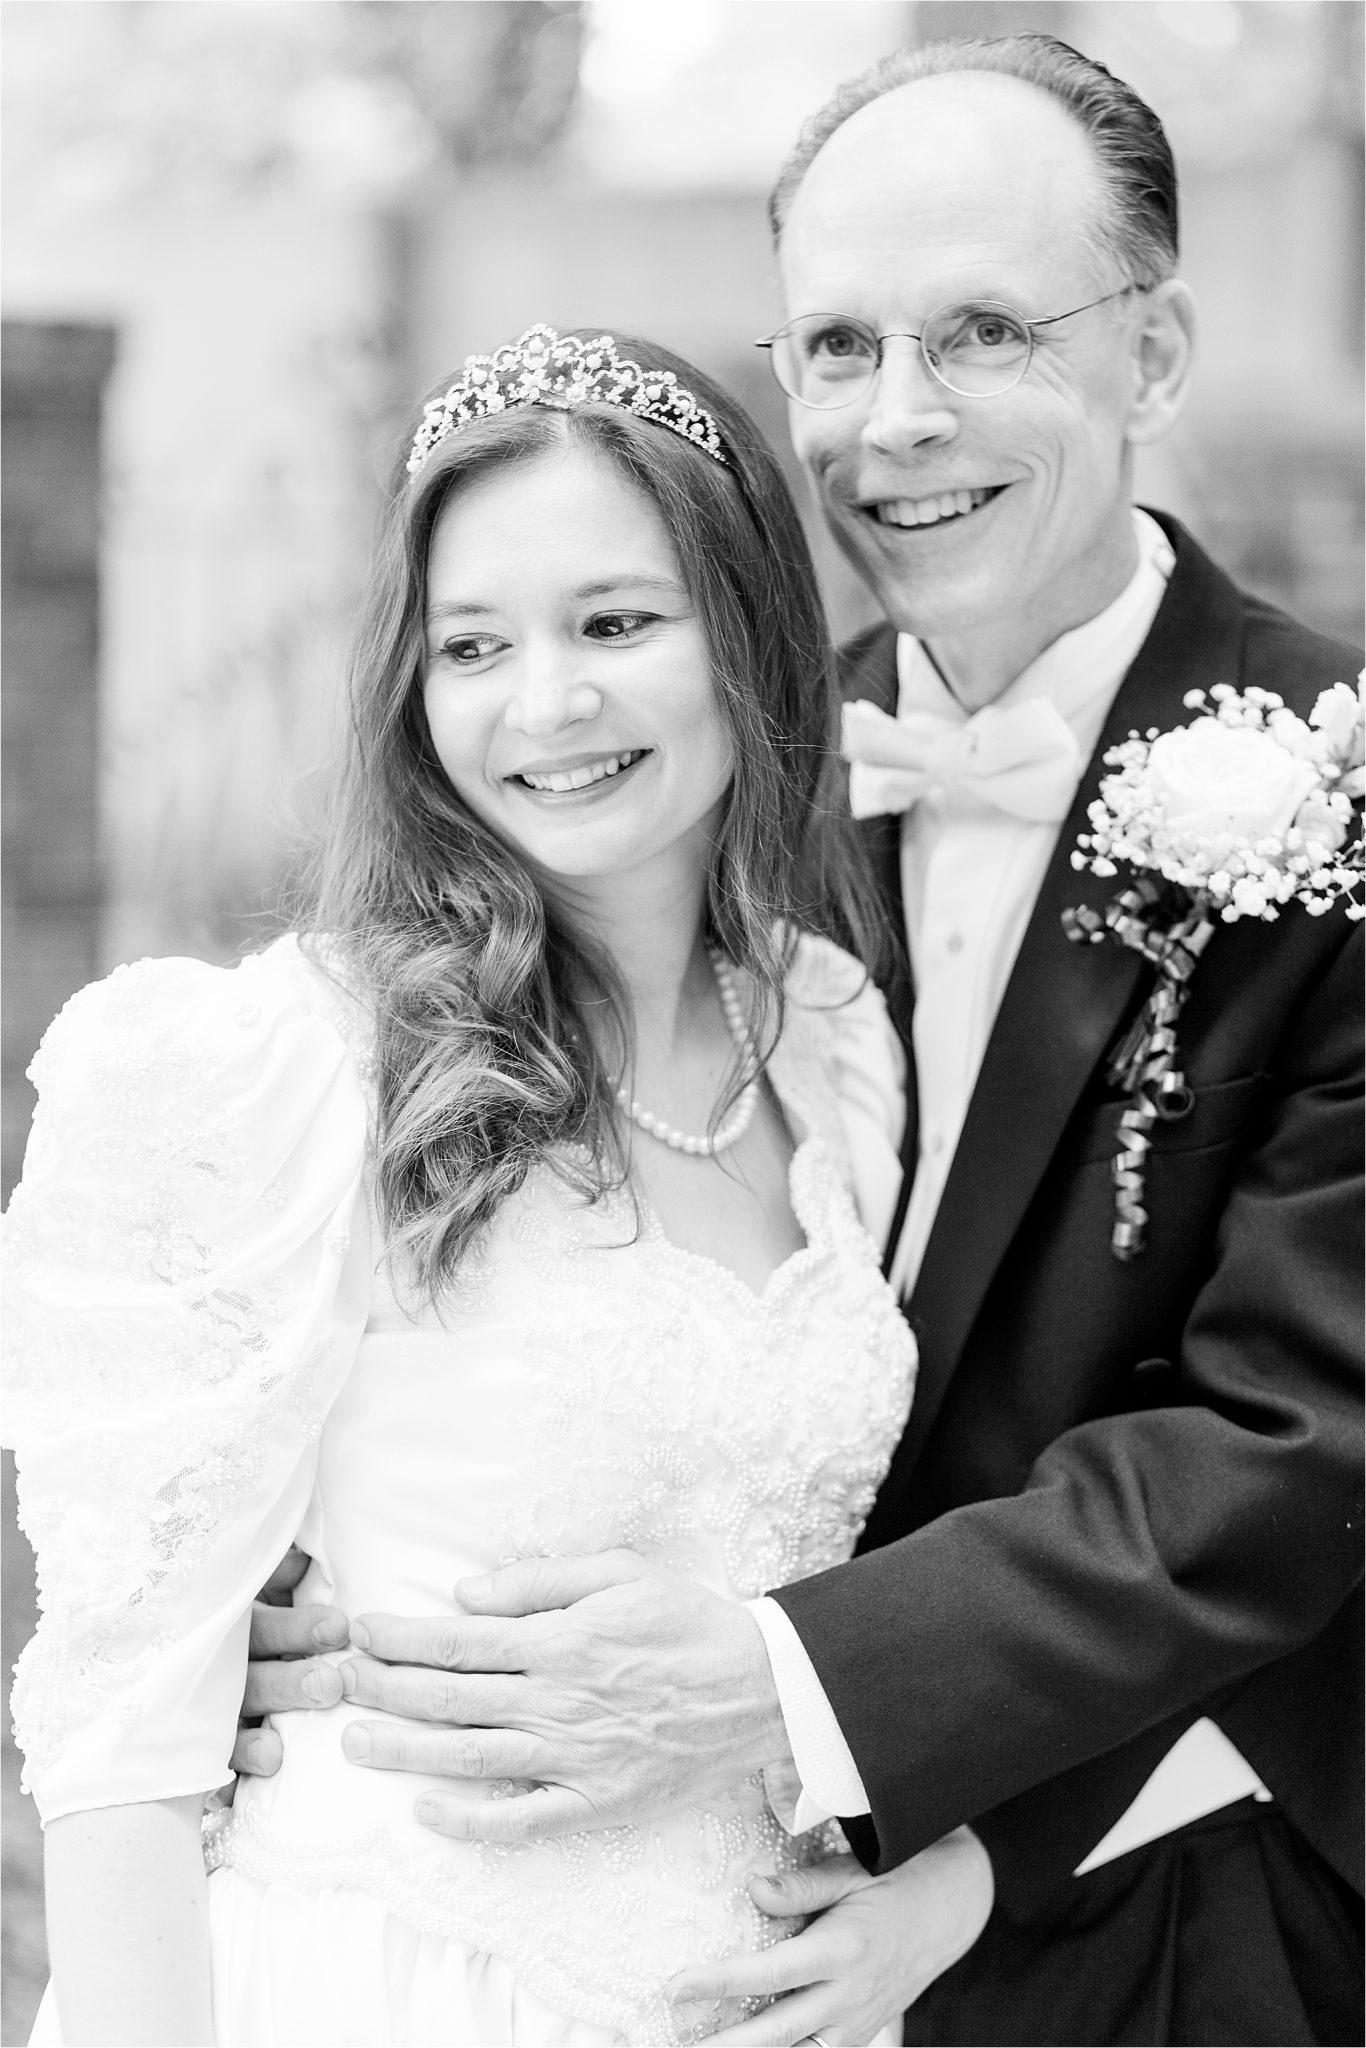 wedding dress-scallop neckline-bridal tiara-mature bride and groom